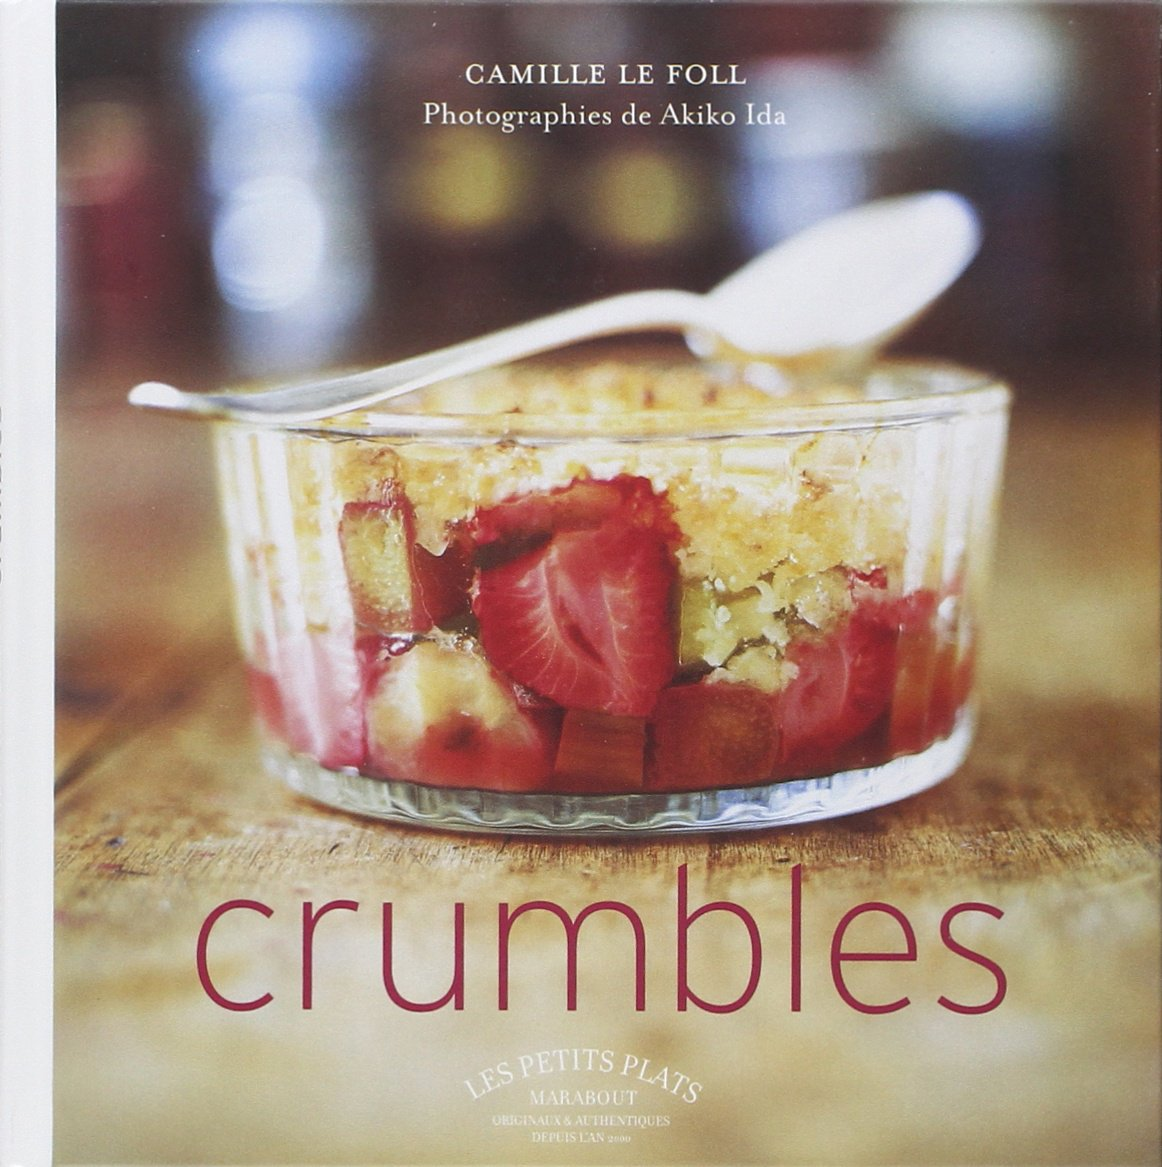 Crumbles Camille Le Foll Amazoncom Books - Cuisine camille foll